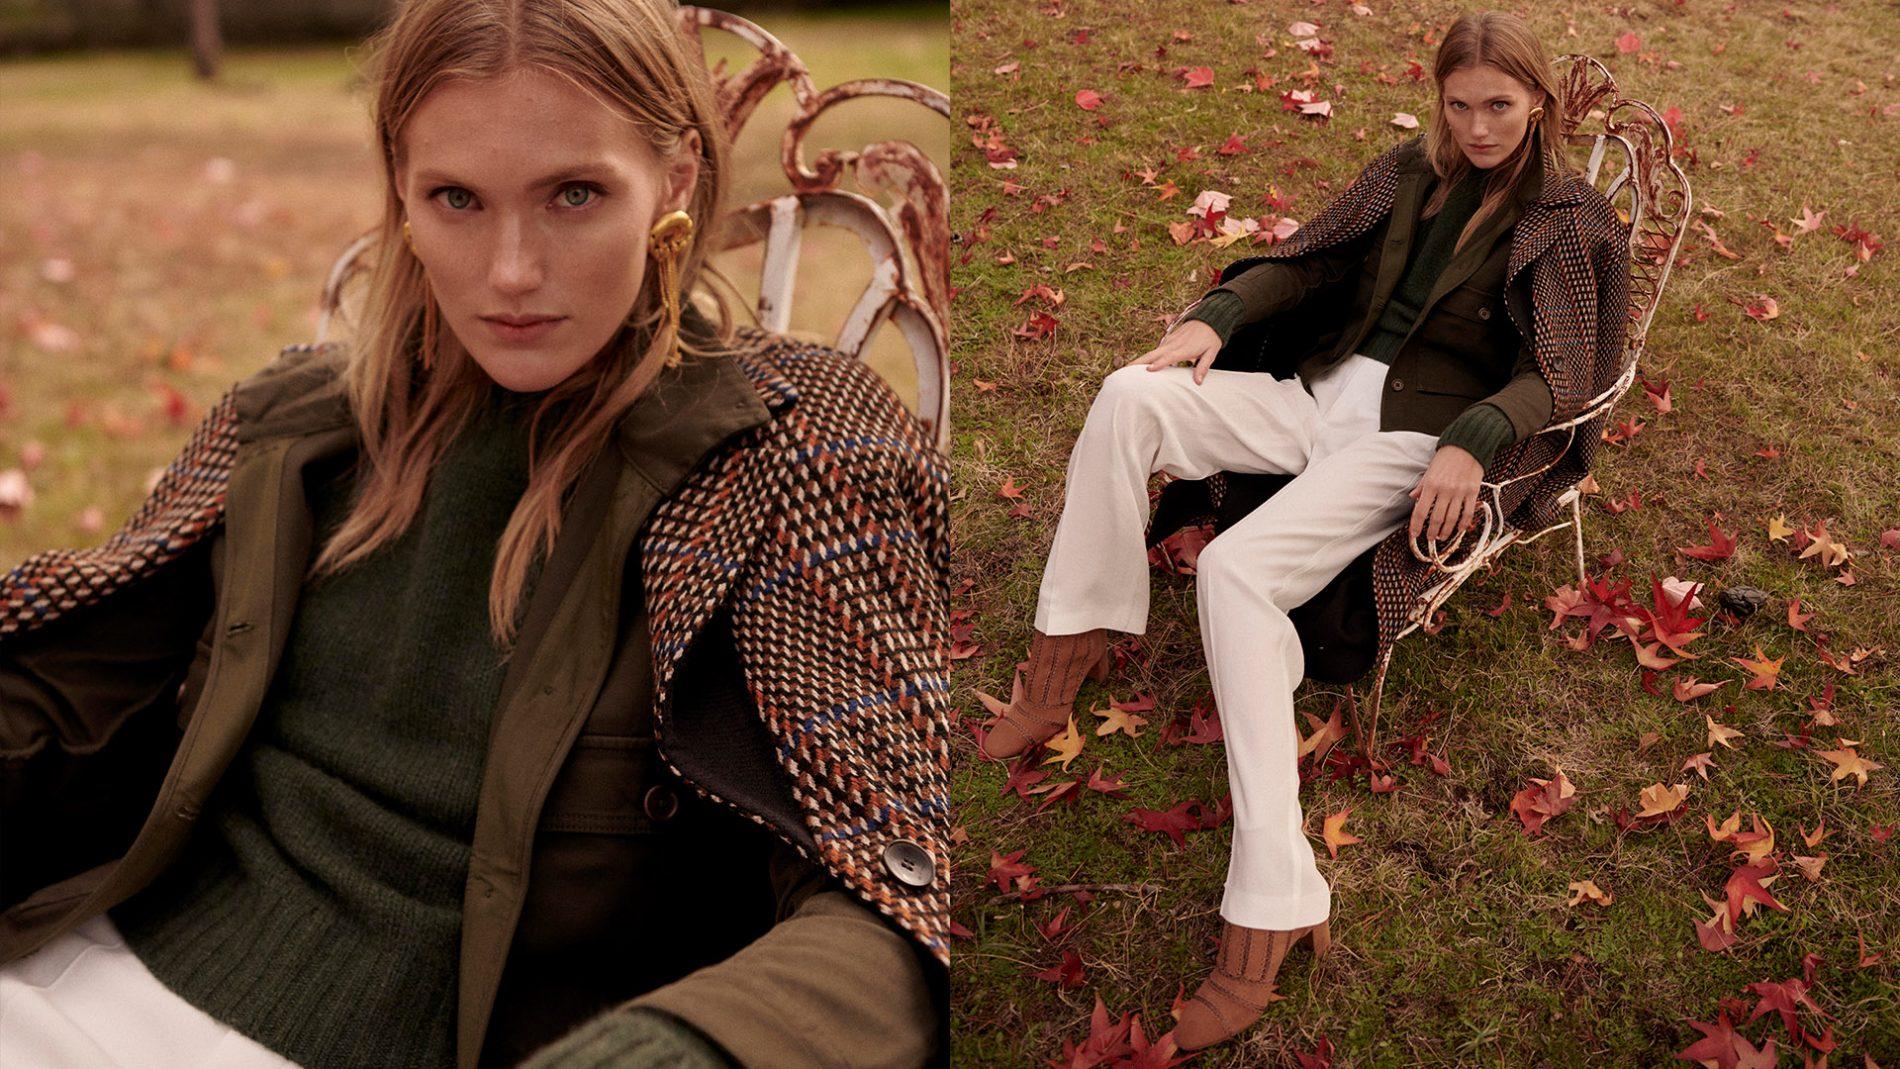 El Corte Inglés Ready-To-Wear Designer Shoes Etro James Perse Alexandre Birman